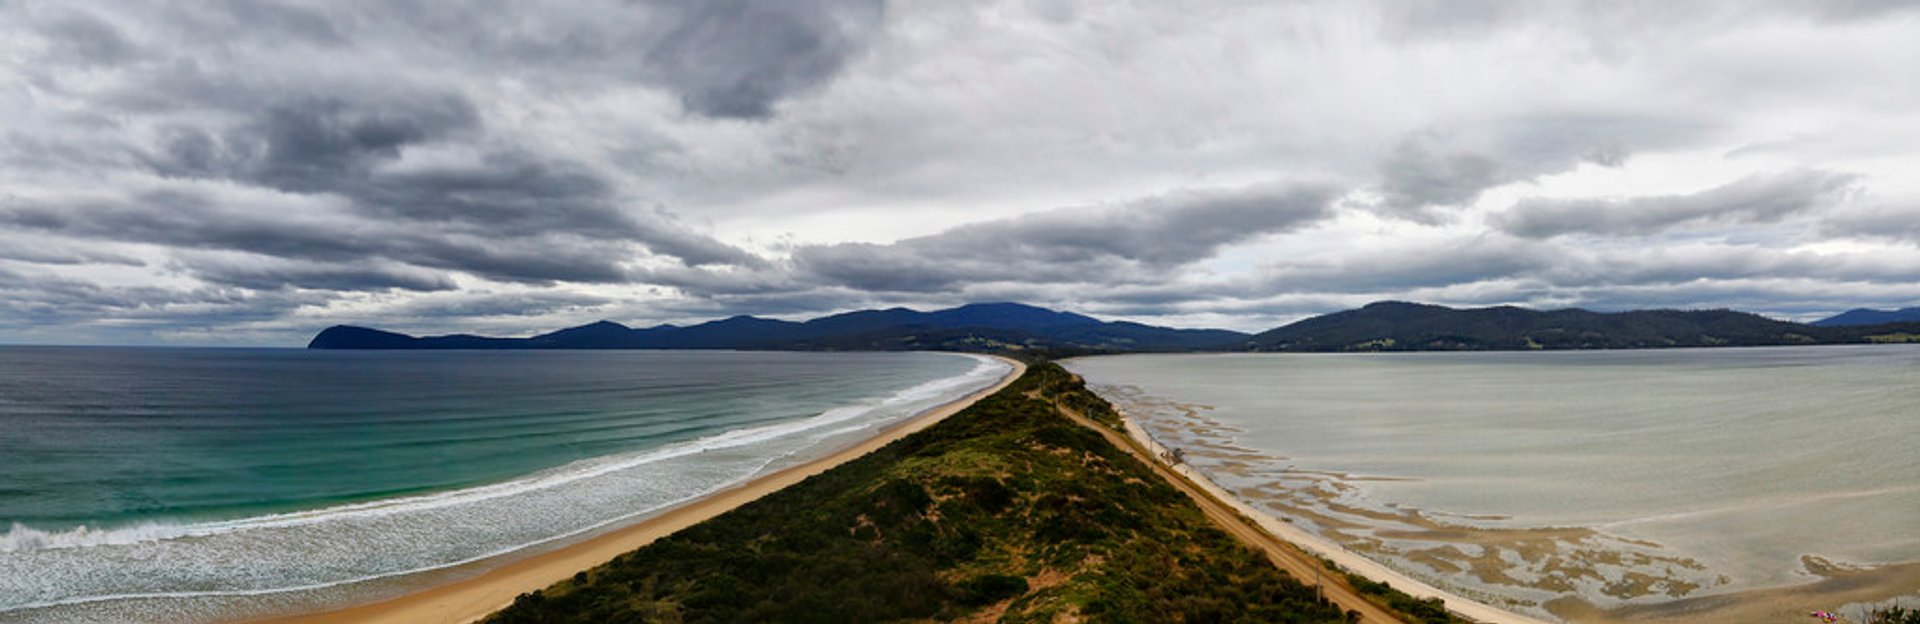 Bruny Island Neck in Tasmania 2019 - Best Time